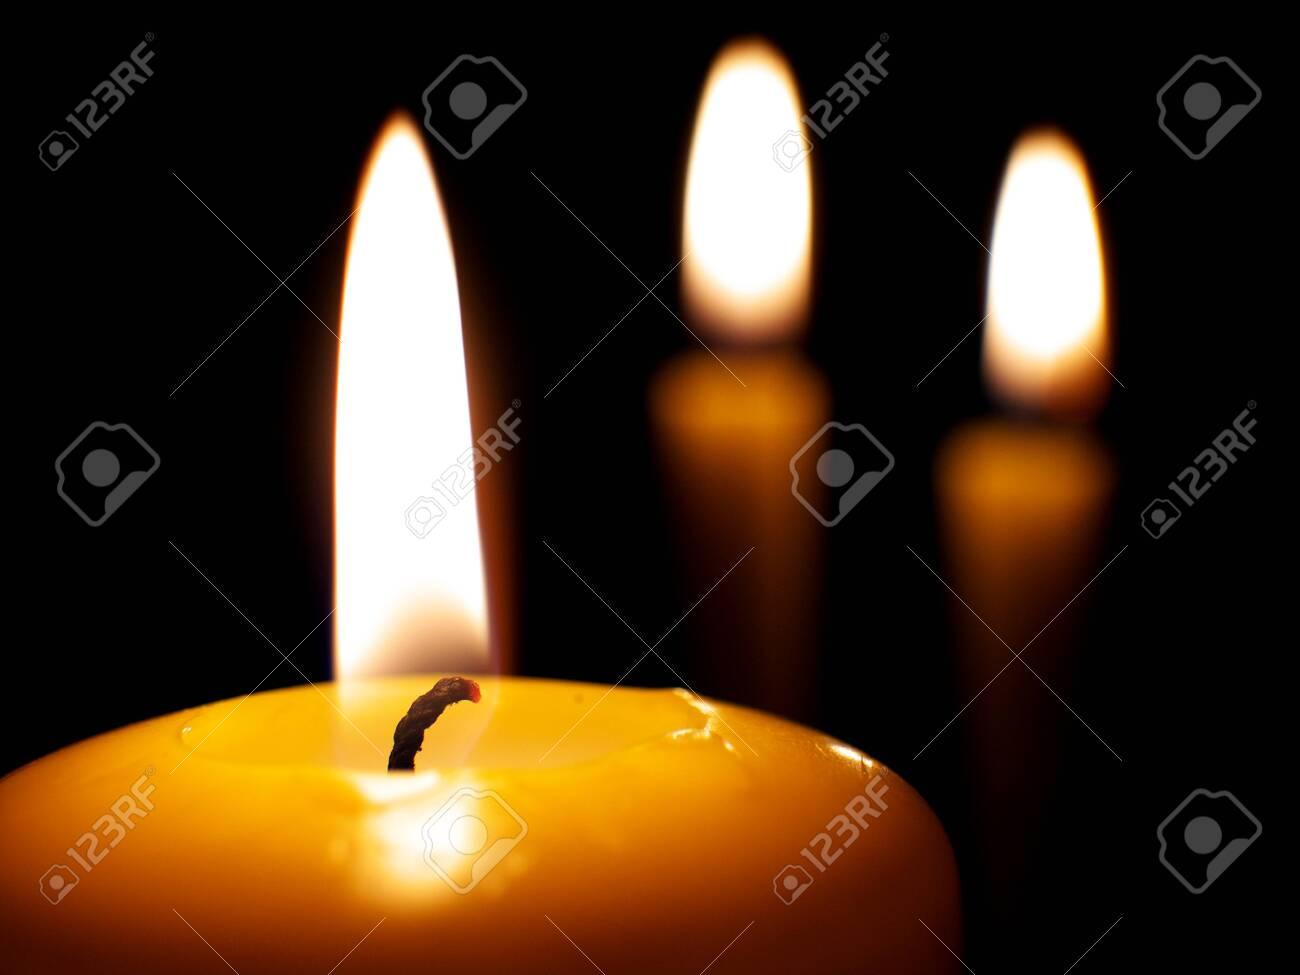 yellow burning candles on dark background, macro - 152881090